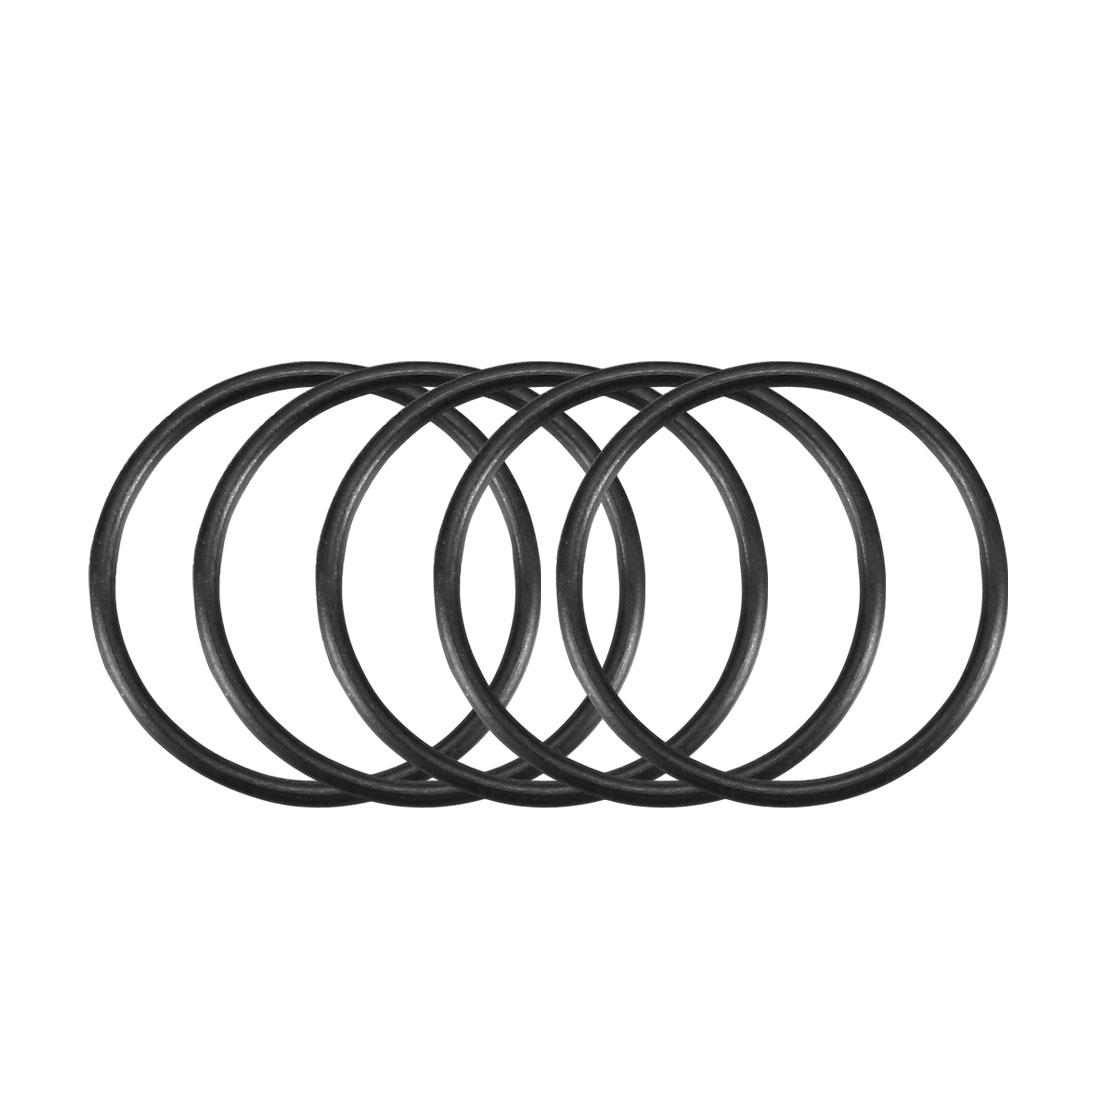 50Pcs Black 17mm x 1mm Nitrile Rubber O Ring NBR Oil Sealing Grommets